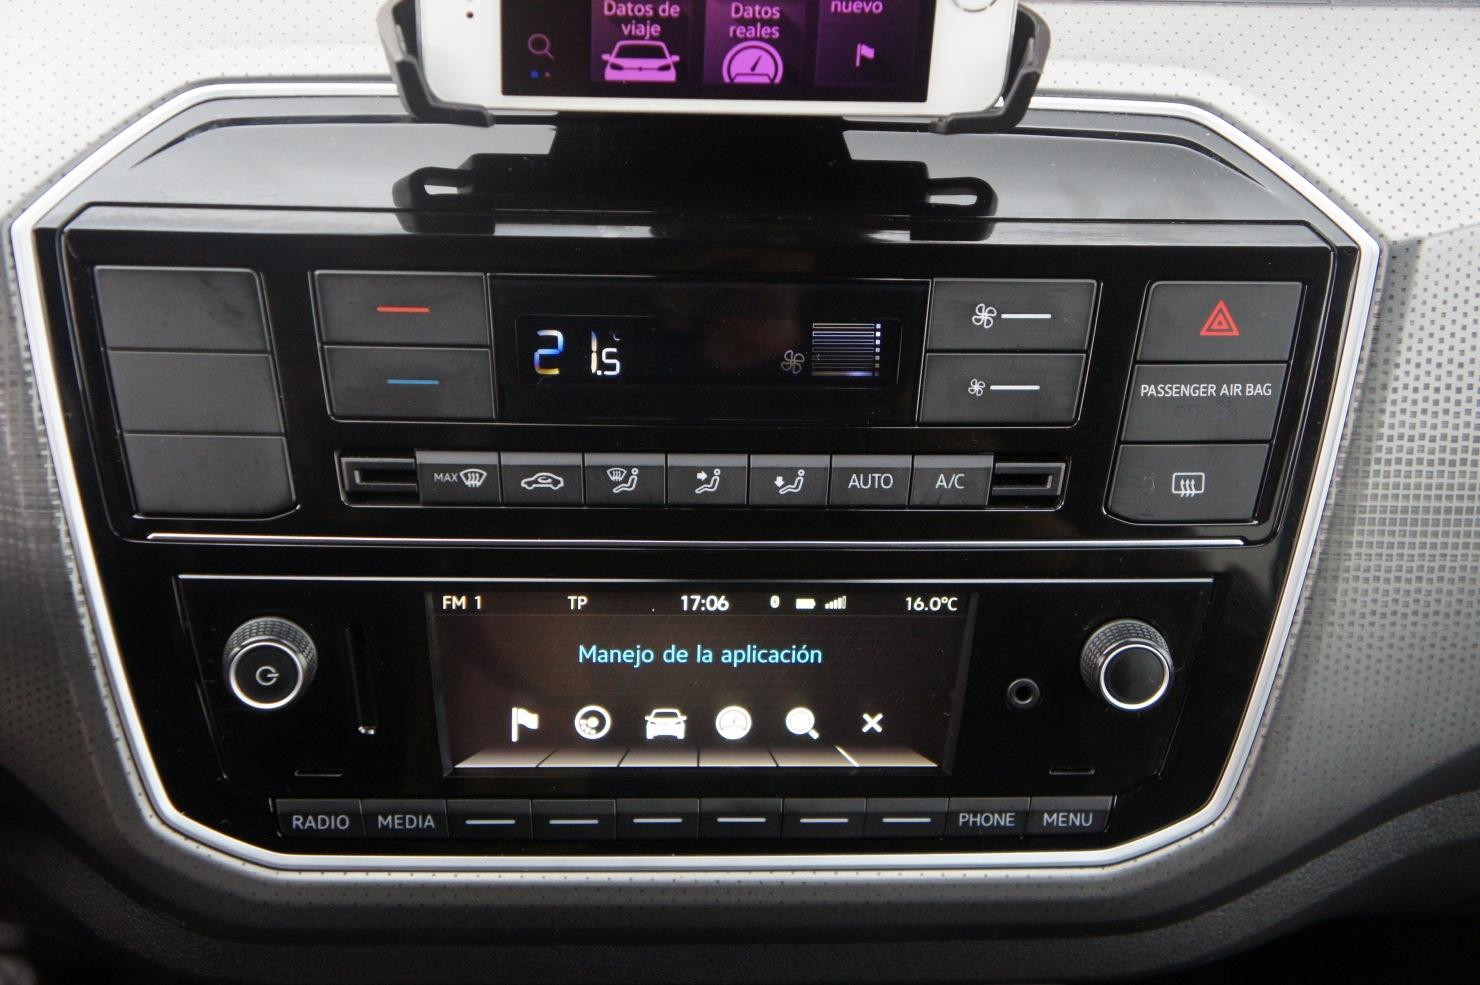 Prueba Volkswagen Up 1 0 Mpi 75 Vs 1 0 Tsi 90 Cv Cuando El Turbo